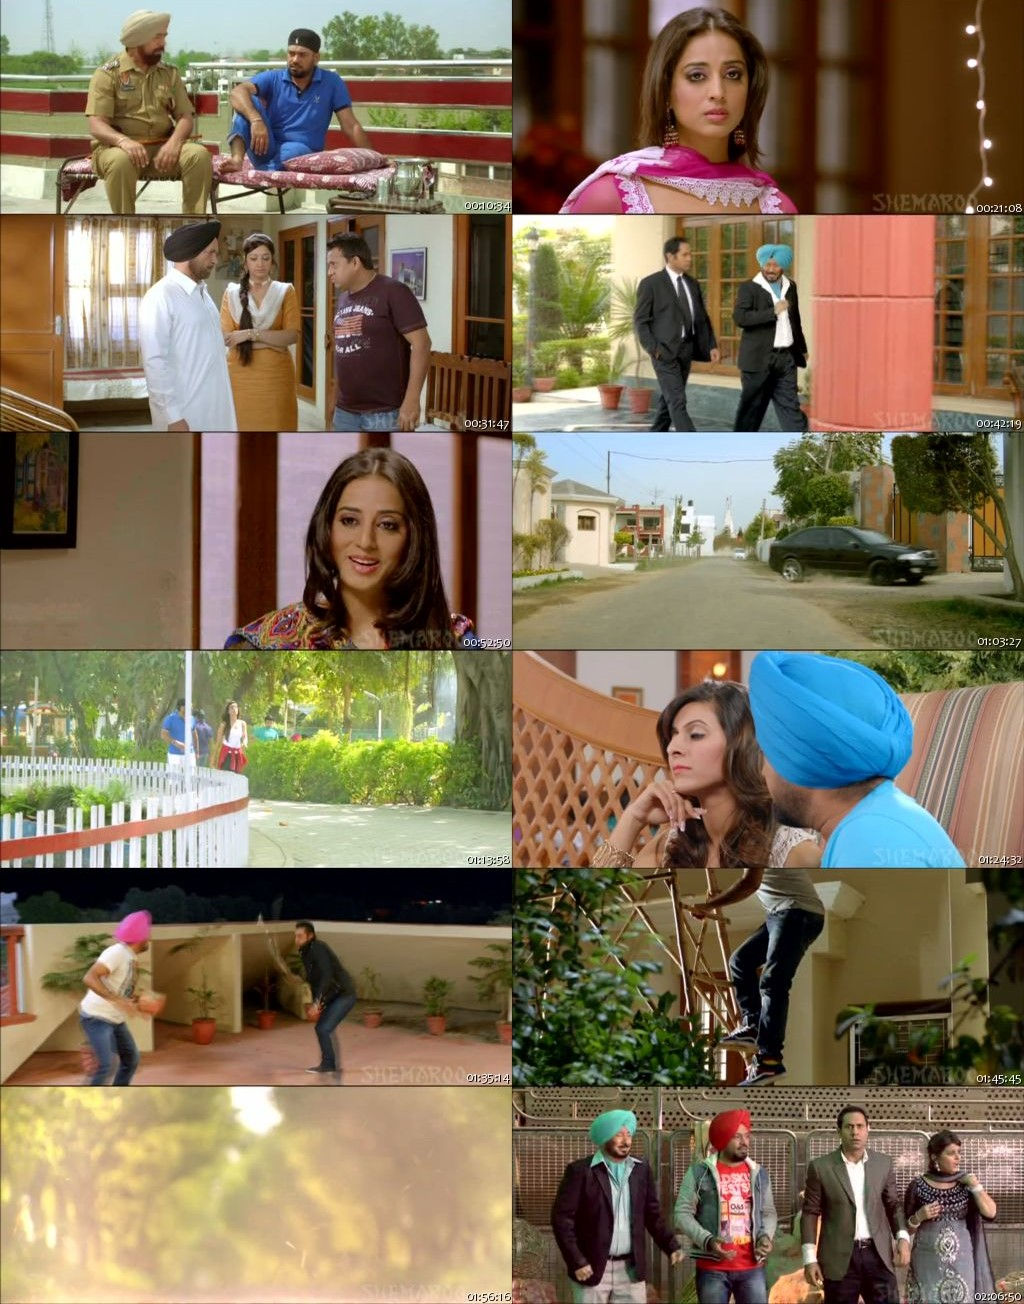 Carry On Jatta 2012 Full Punjabi Movie Online Watch DVDRip 720p